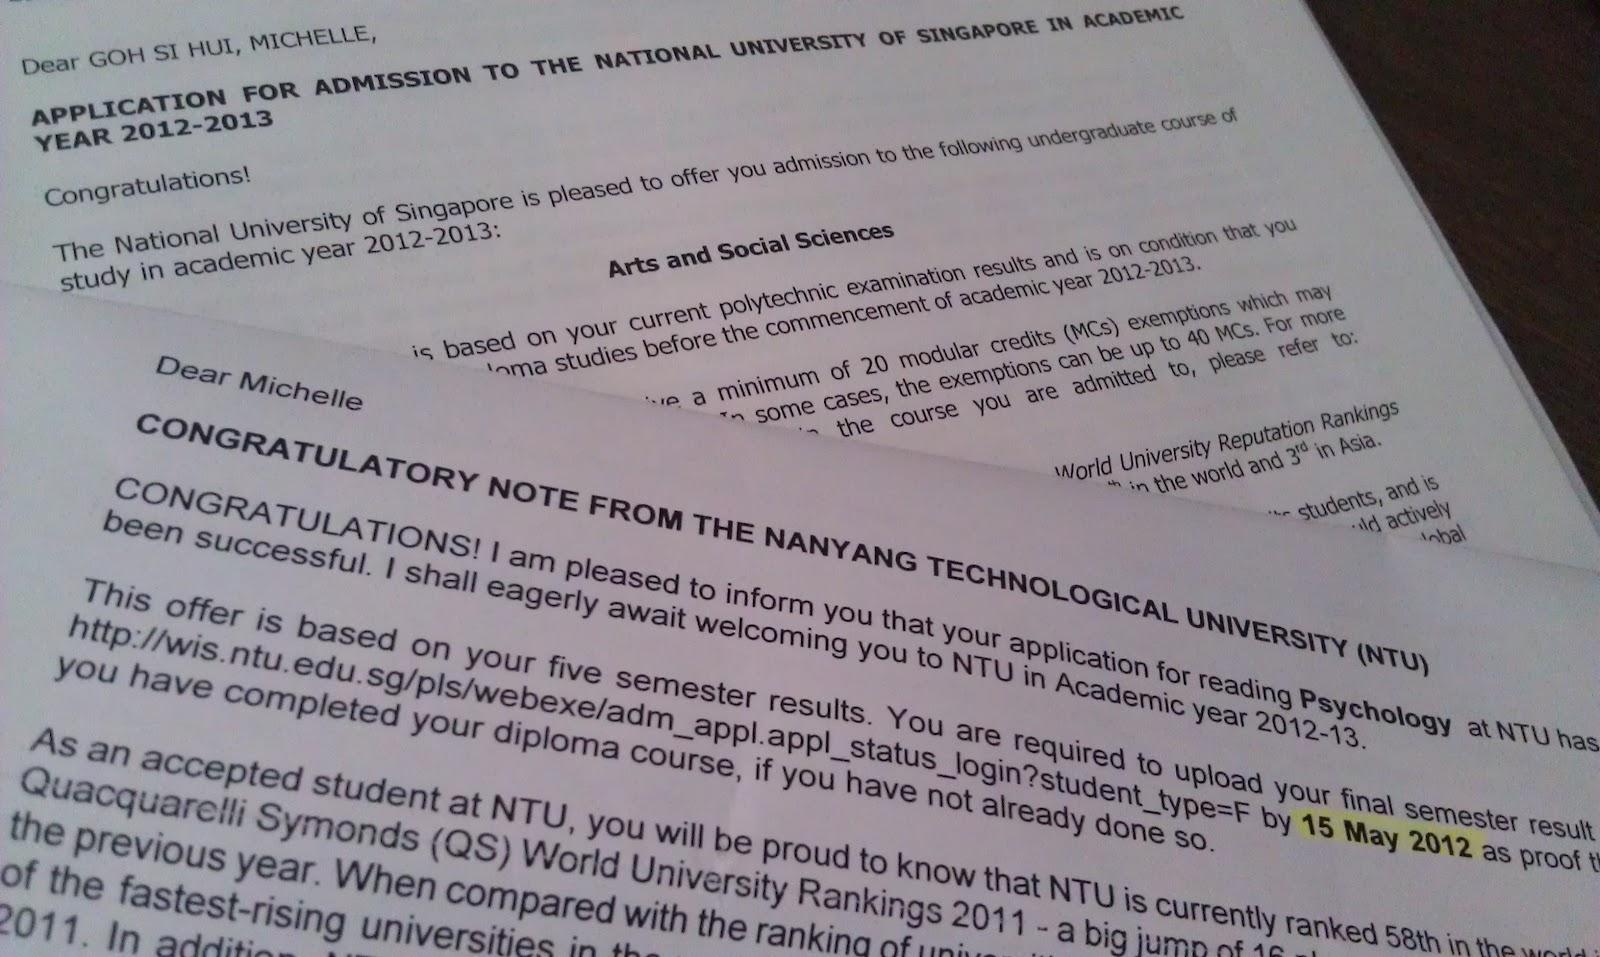 nus online application status